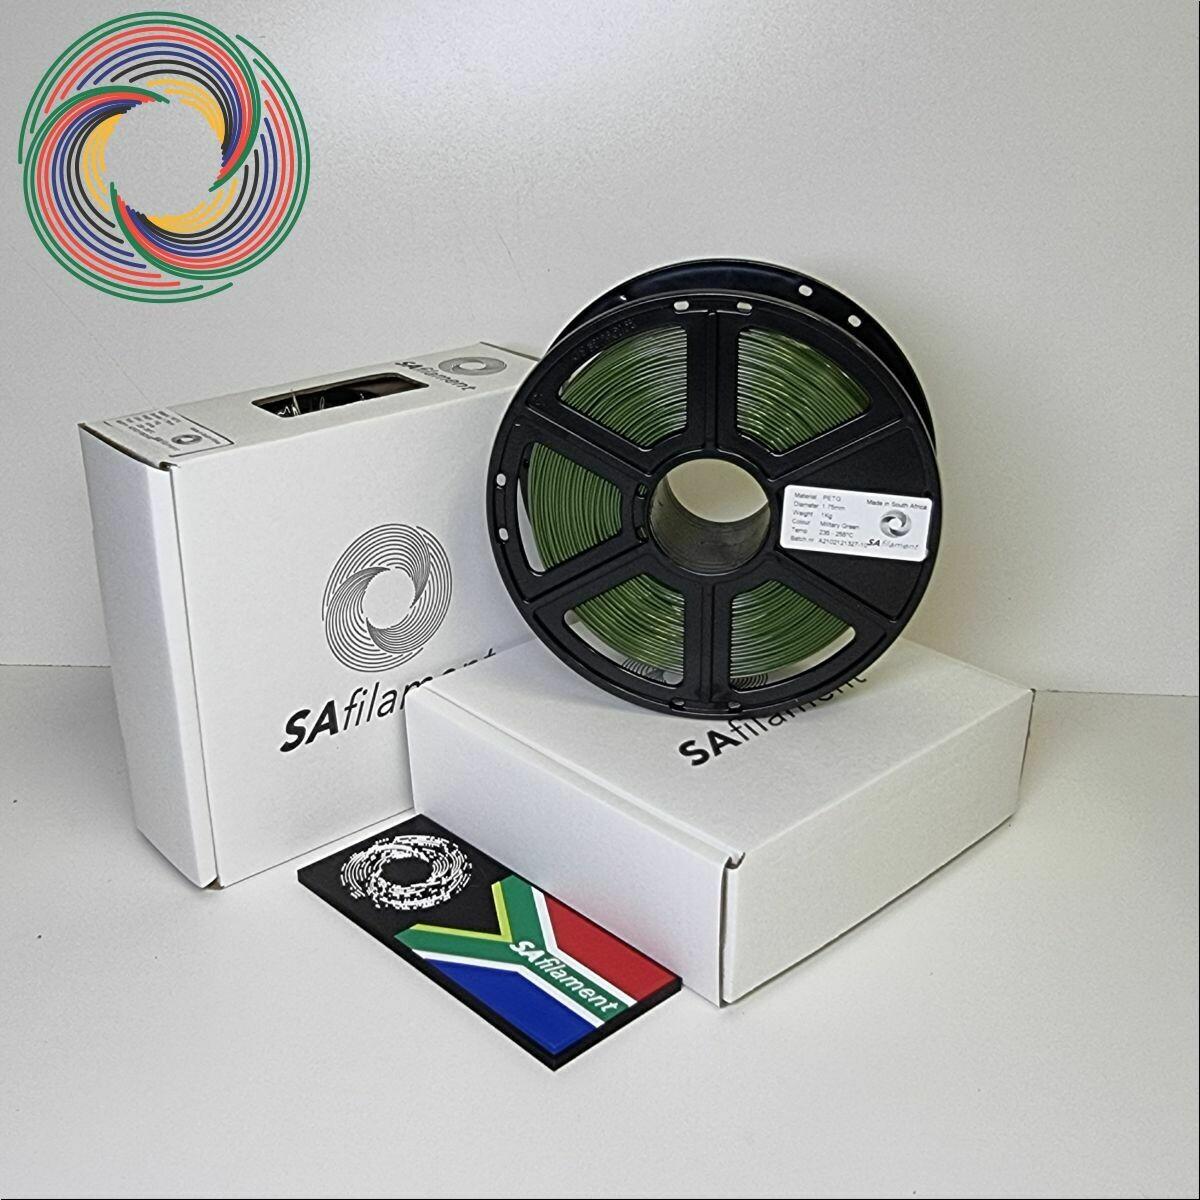 Military Green PetG Filament, 1Kg, 1.75mm by SA Filament